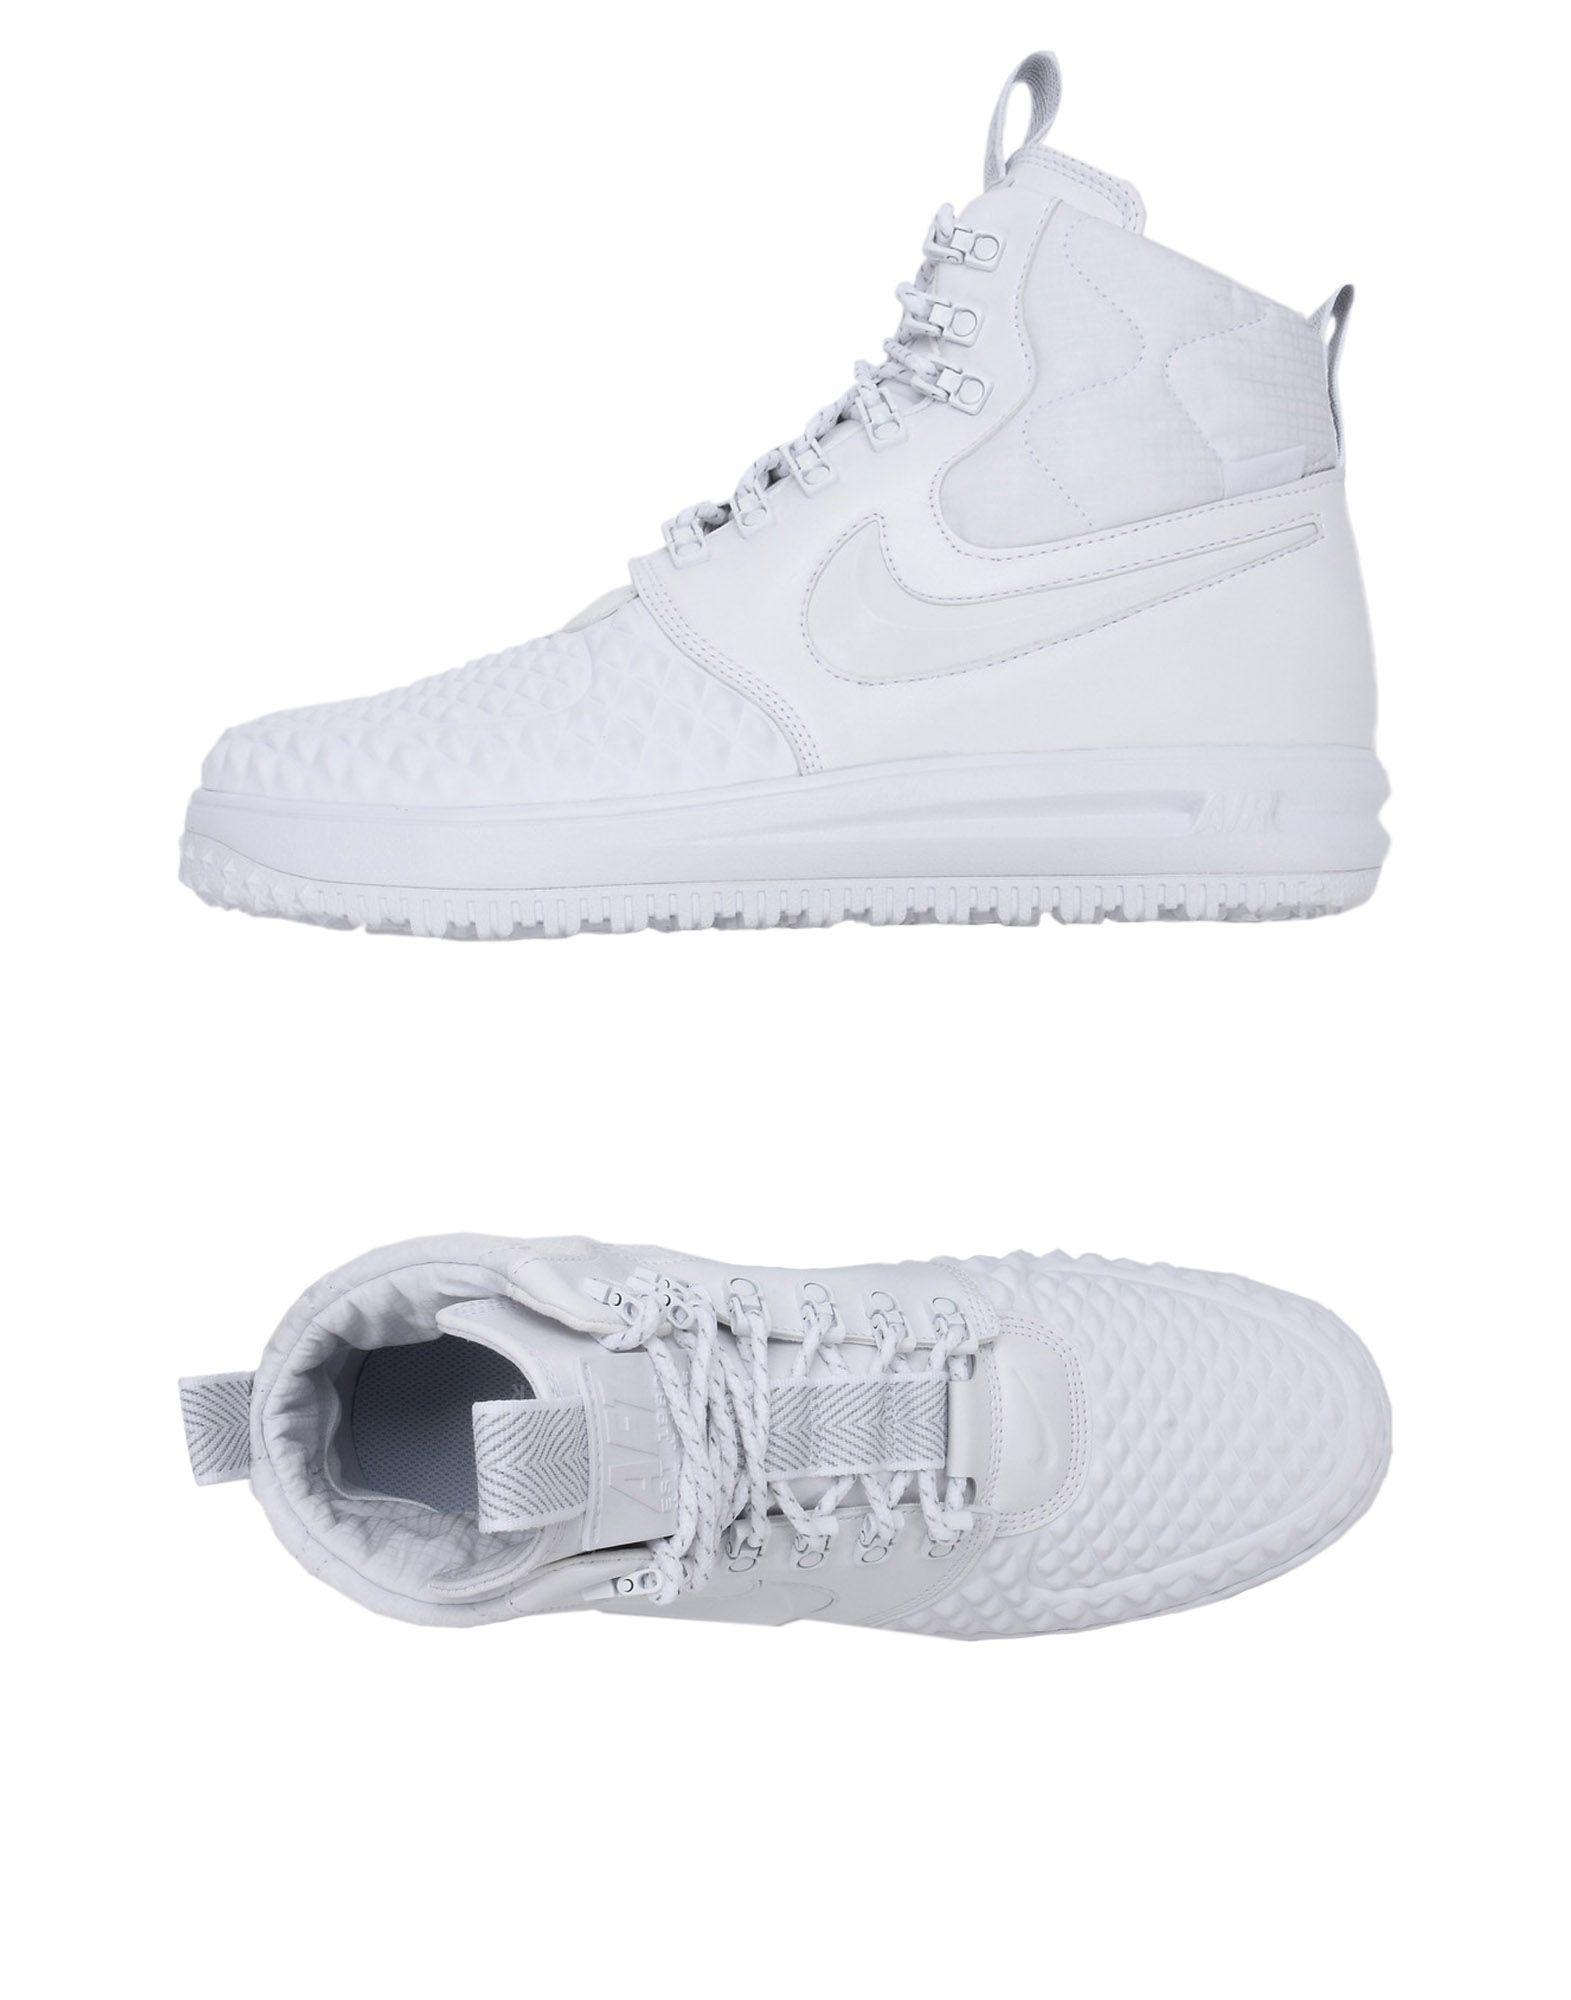 Nike Lf1 Duckboot '17 Prm  11406315VO Neue Schuhe